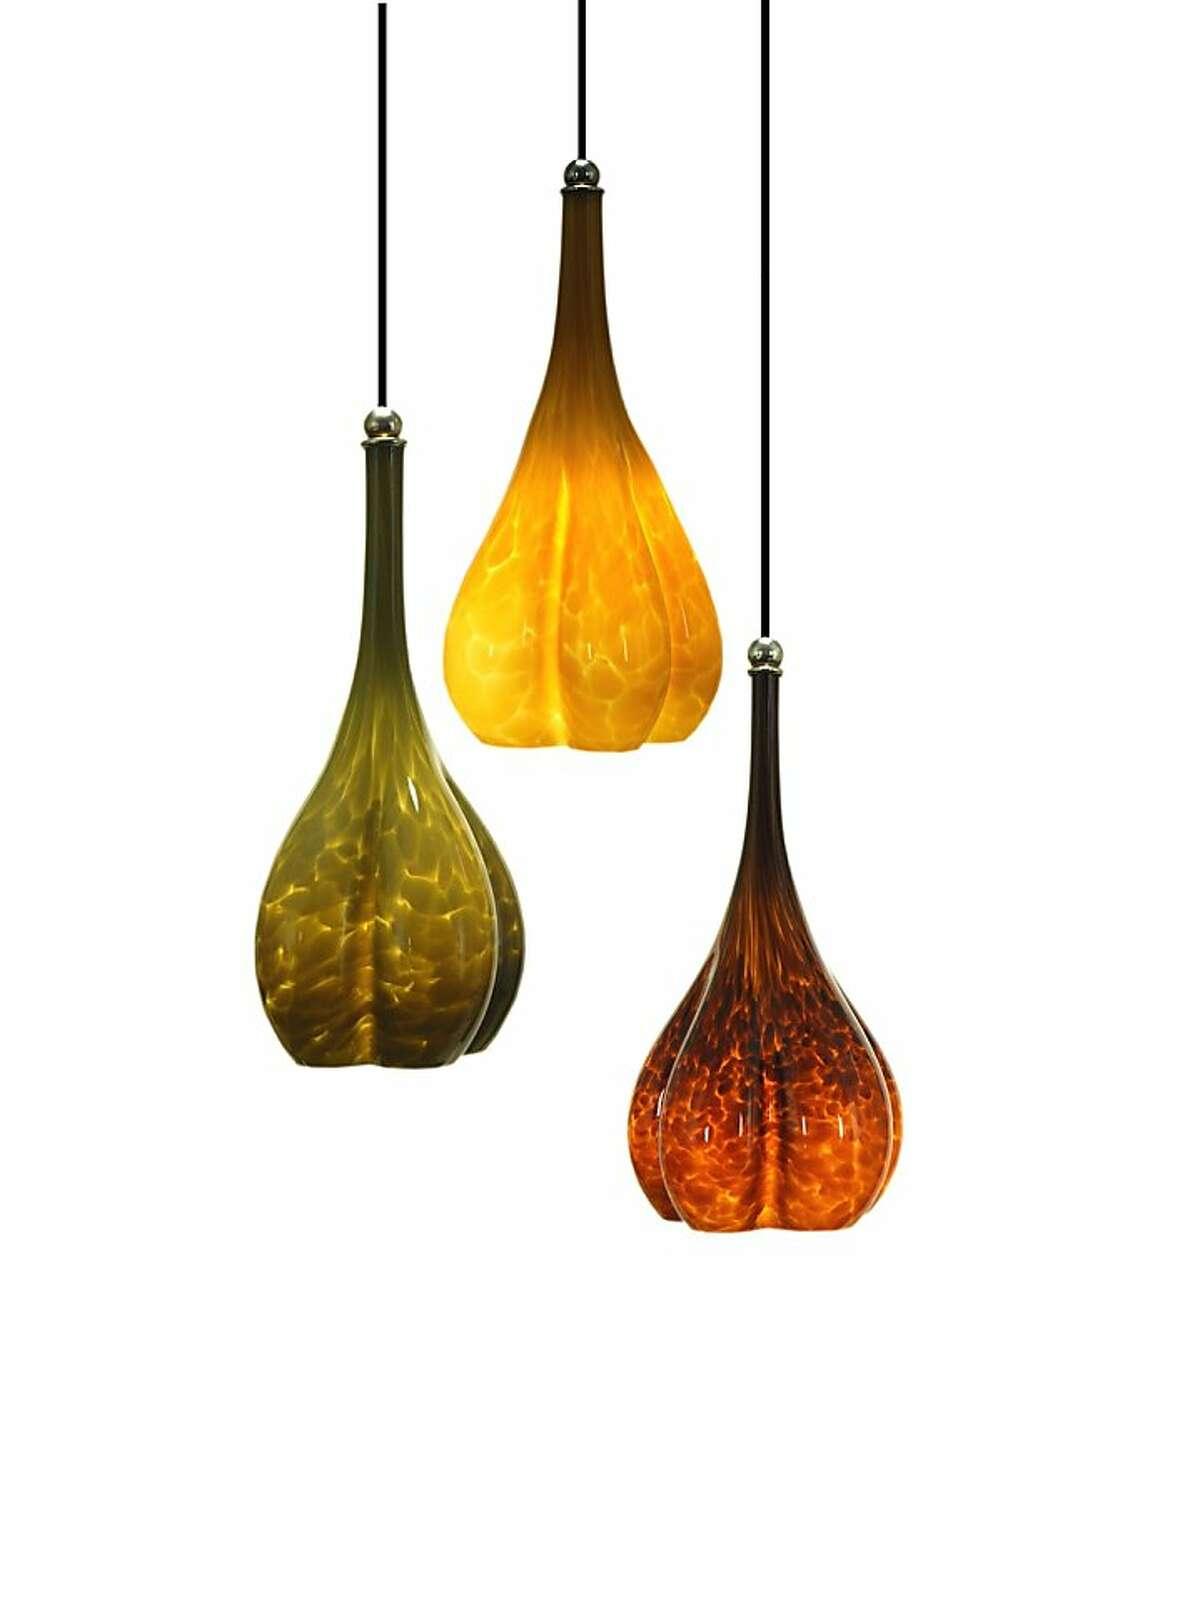 Light fixtures from Union Street Glass.